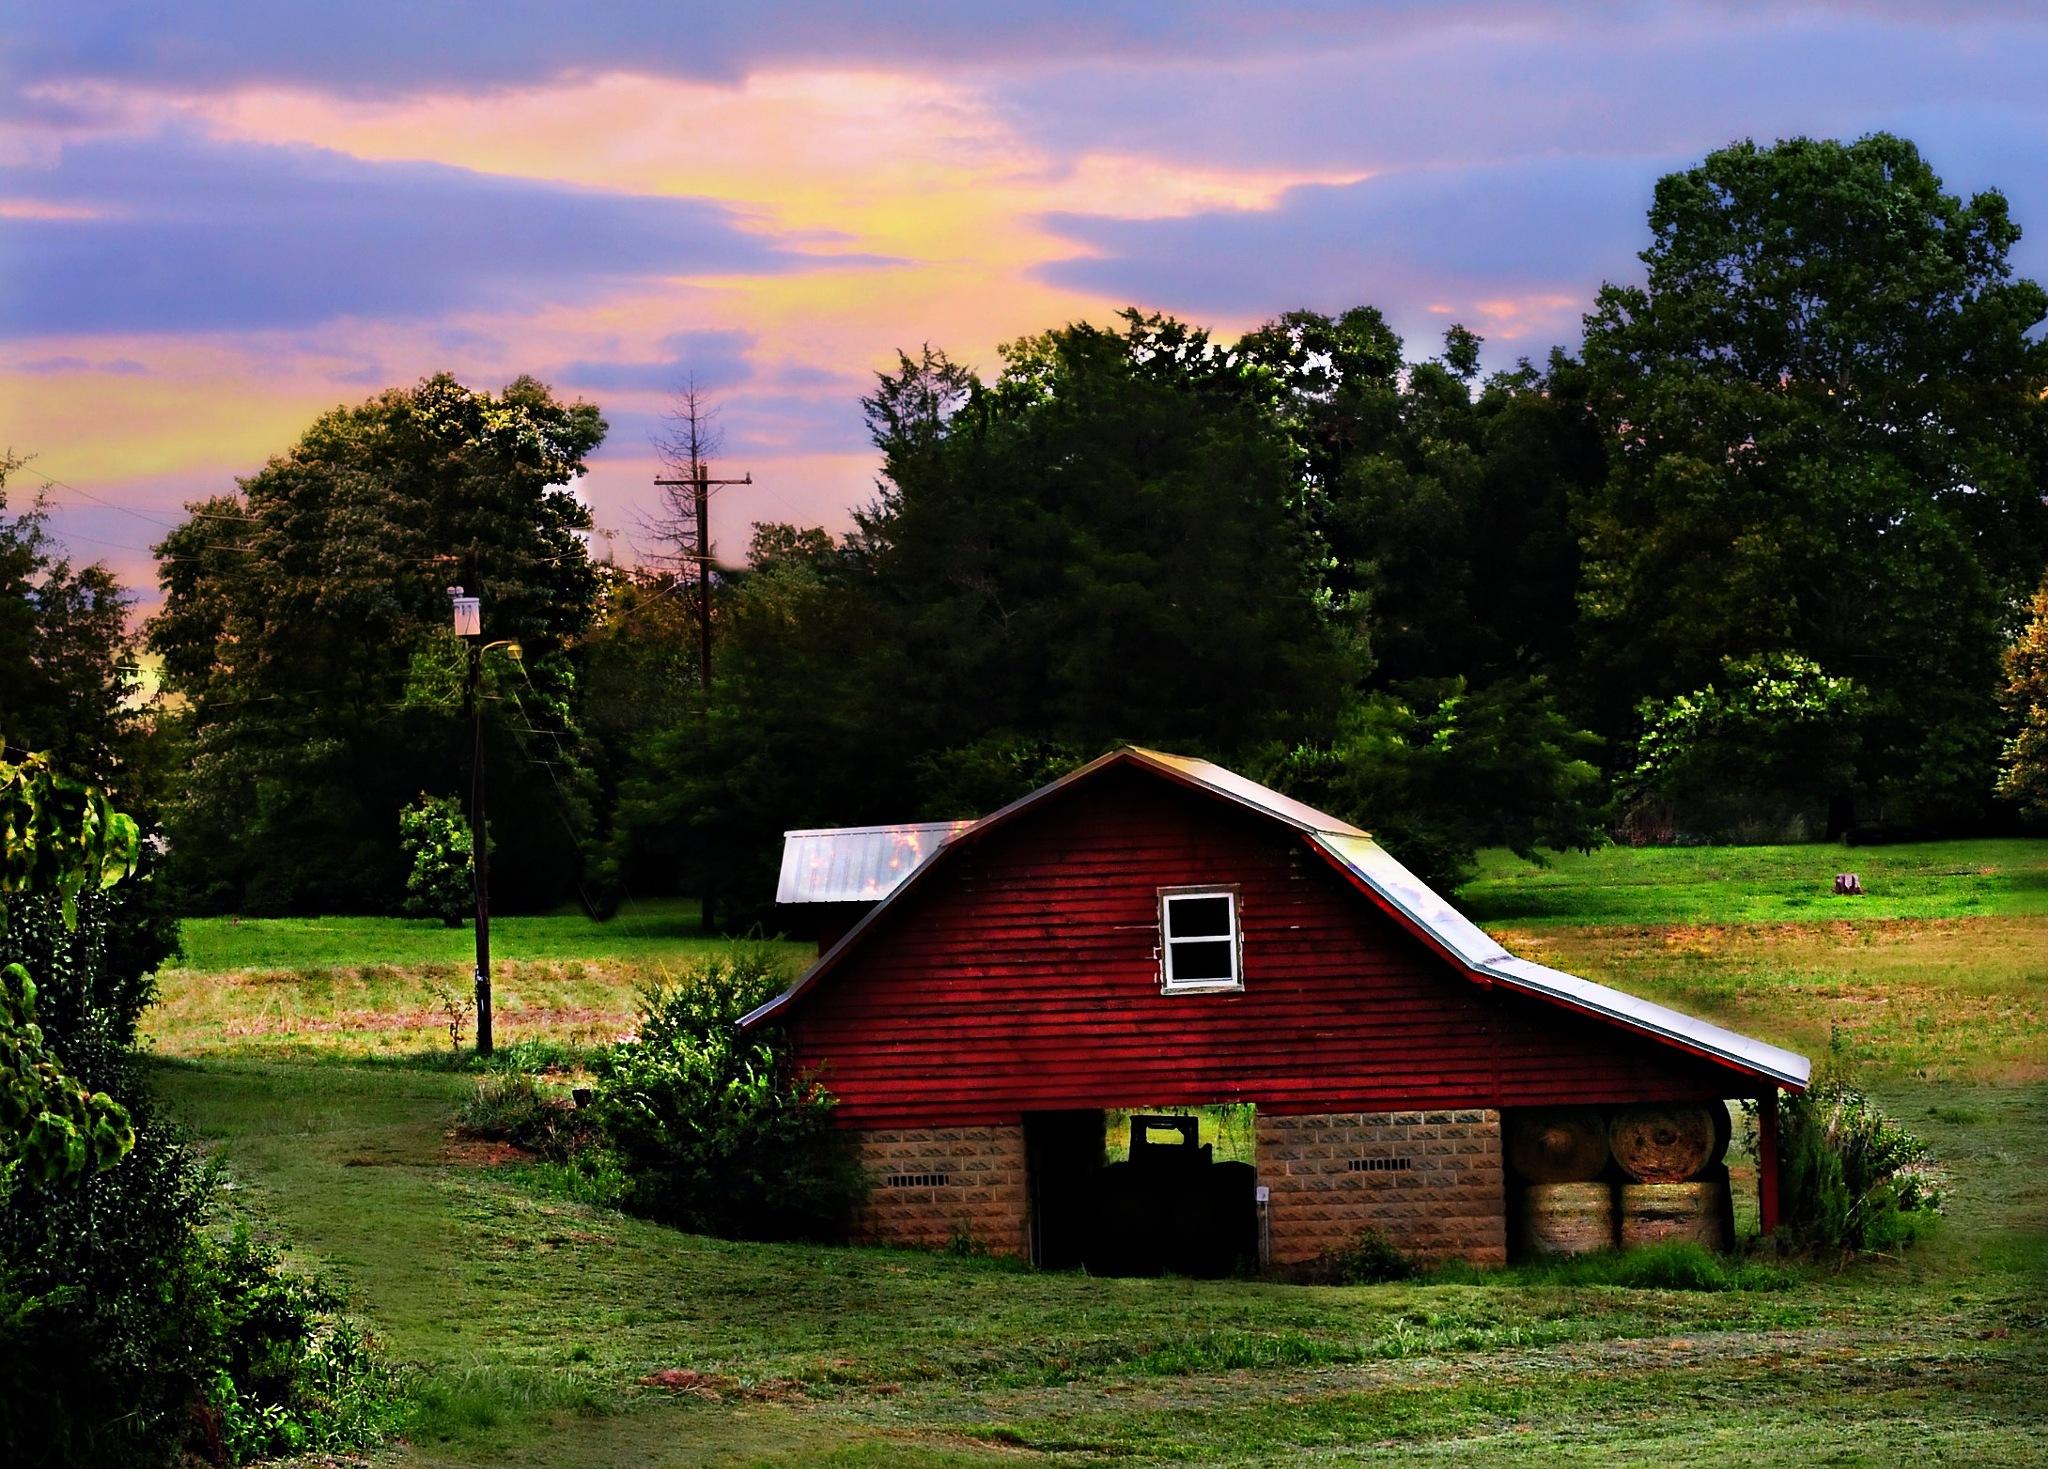 Rustic Farm Scene by Tom Horonzy